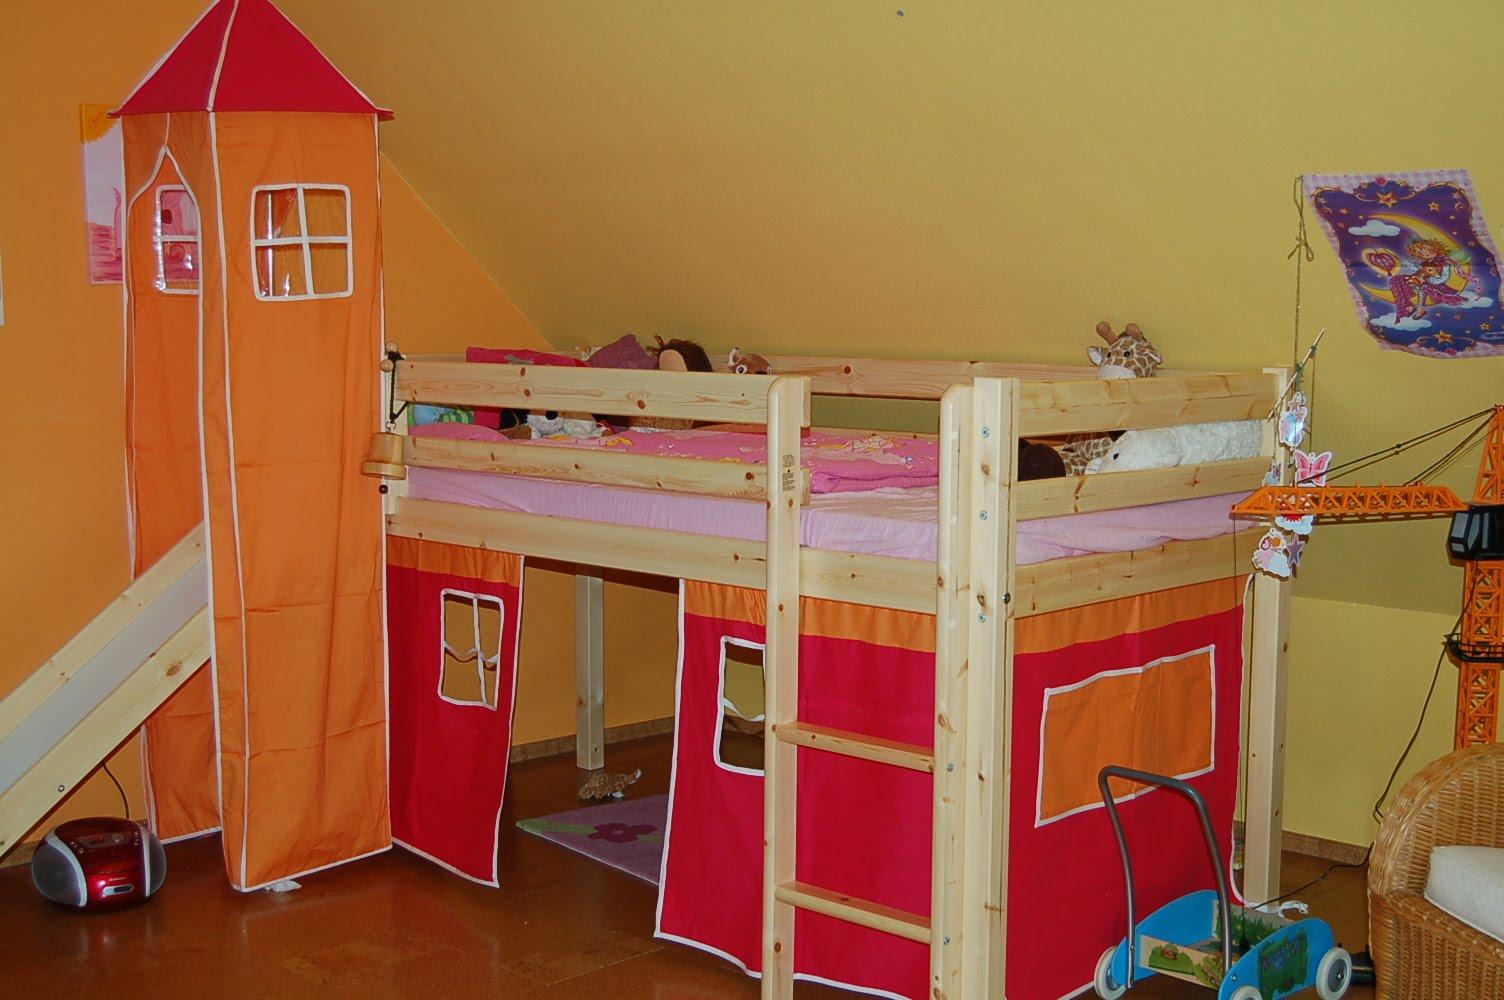 prinzessin hochbett. Black Bedroom Furniture Sets. Home Design Ideas